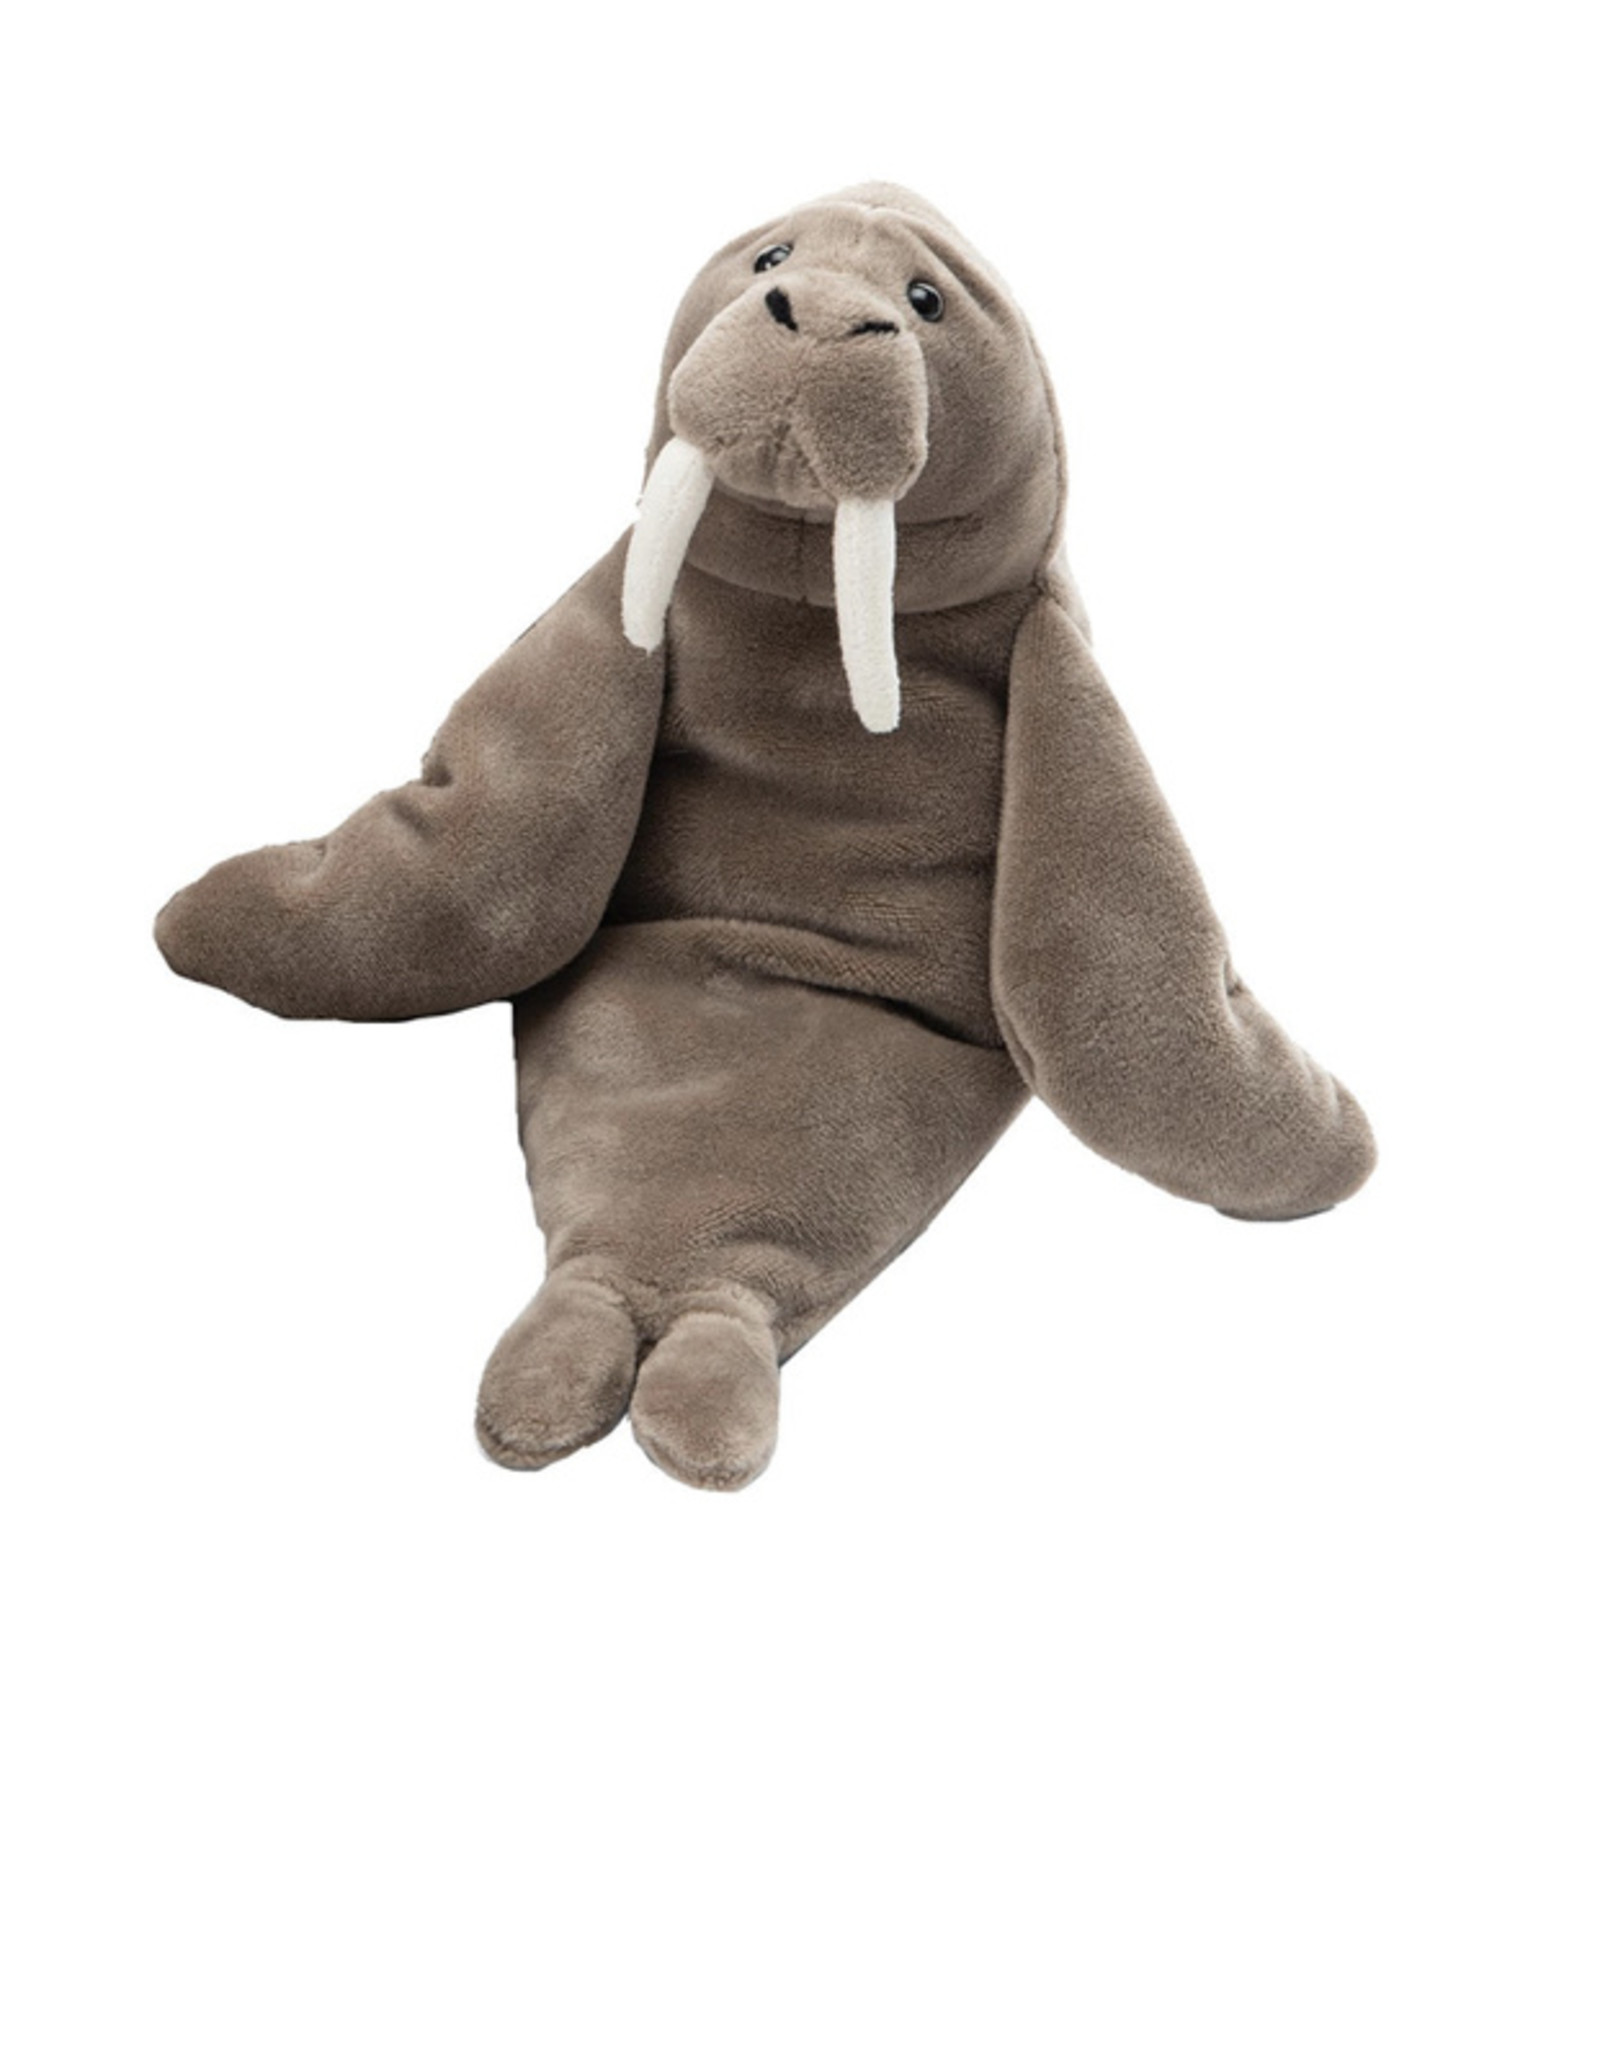 JellyCat - Wrinkles Walrus - Medium